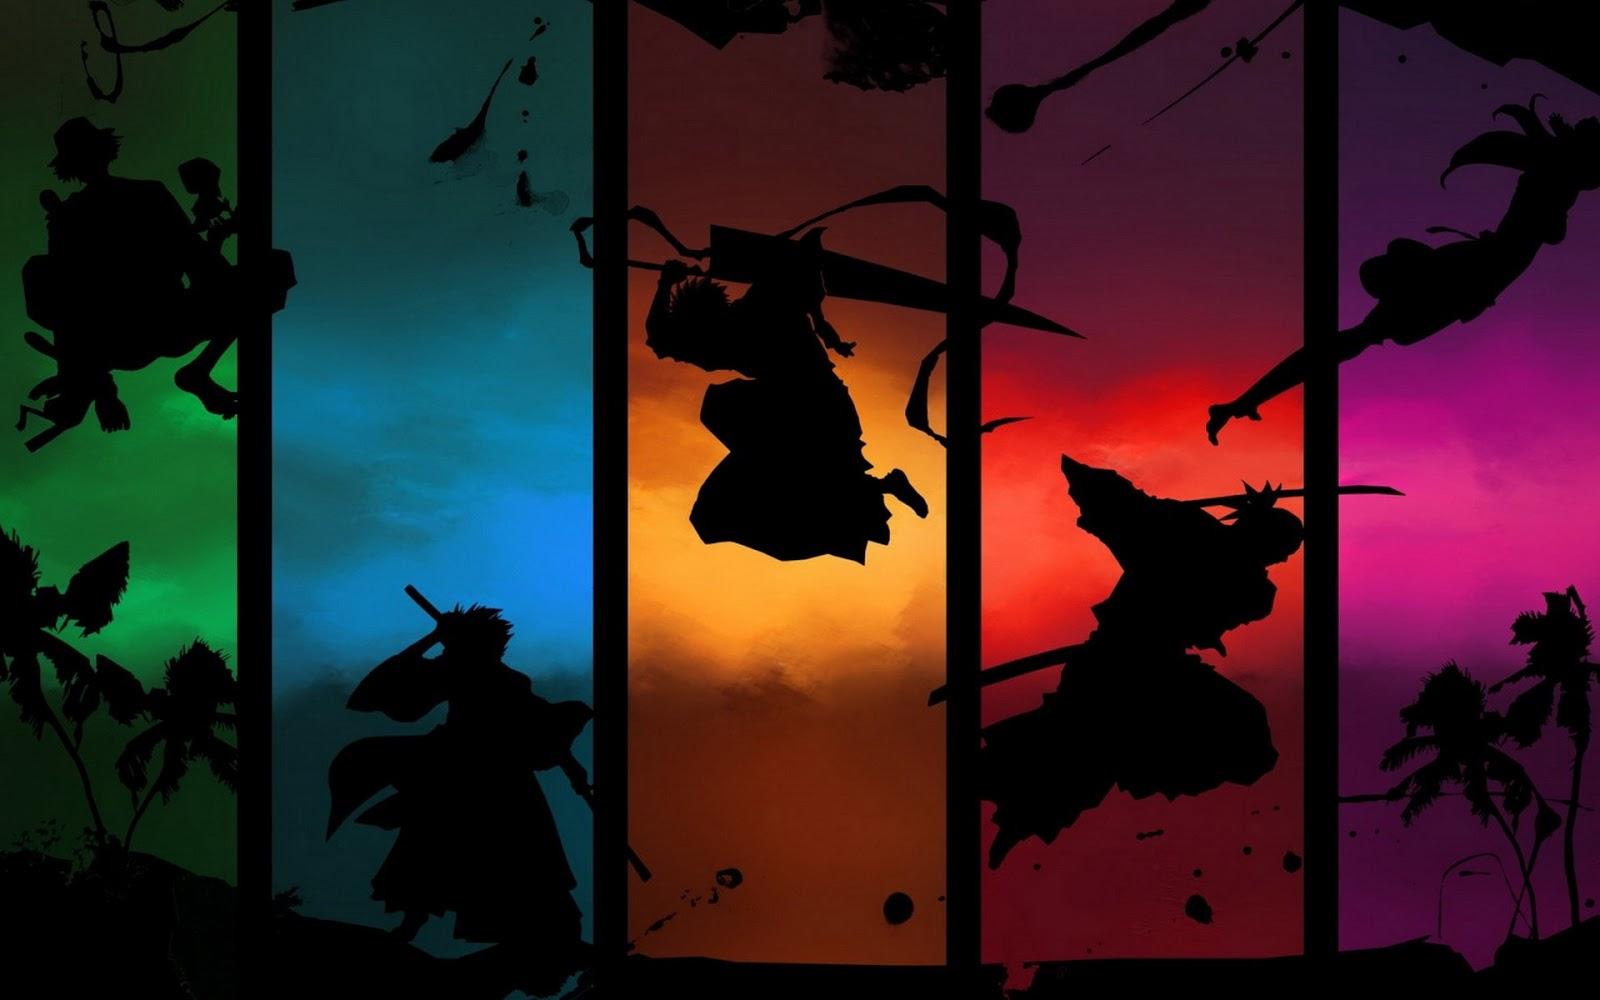 http://1.bp.blogspot.com/-JoQBf9BOGj4/ULTkDChw8yI/AAAAAAAAAZI/i-fe9SHM8g8/s1600/bleach_anime-1920x1200.jpg